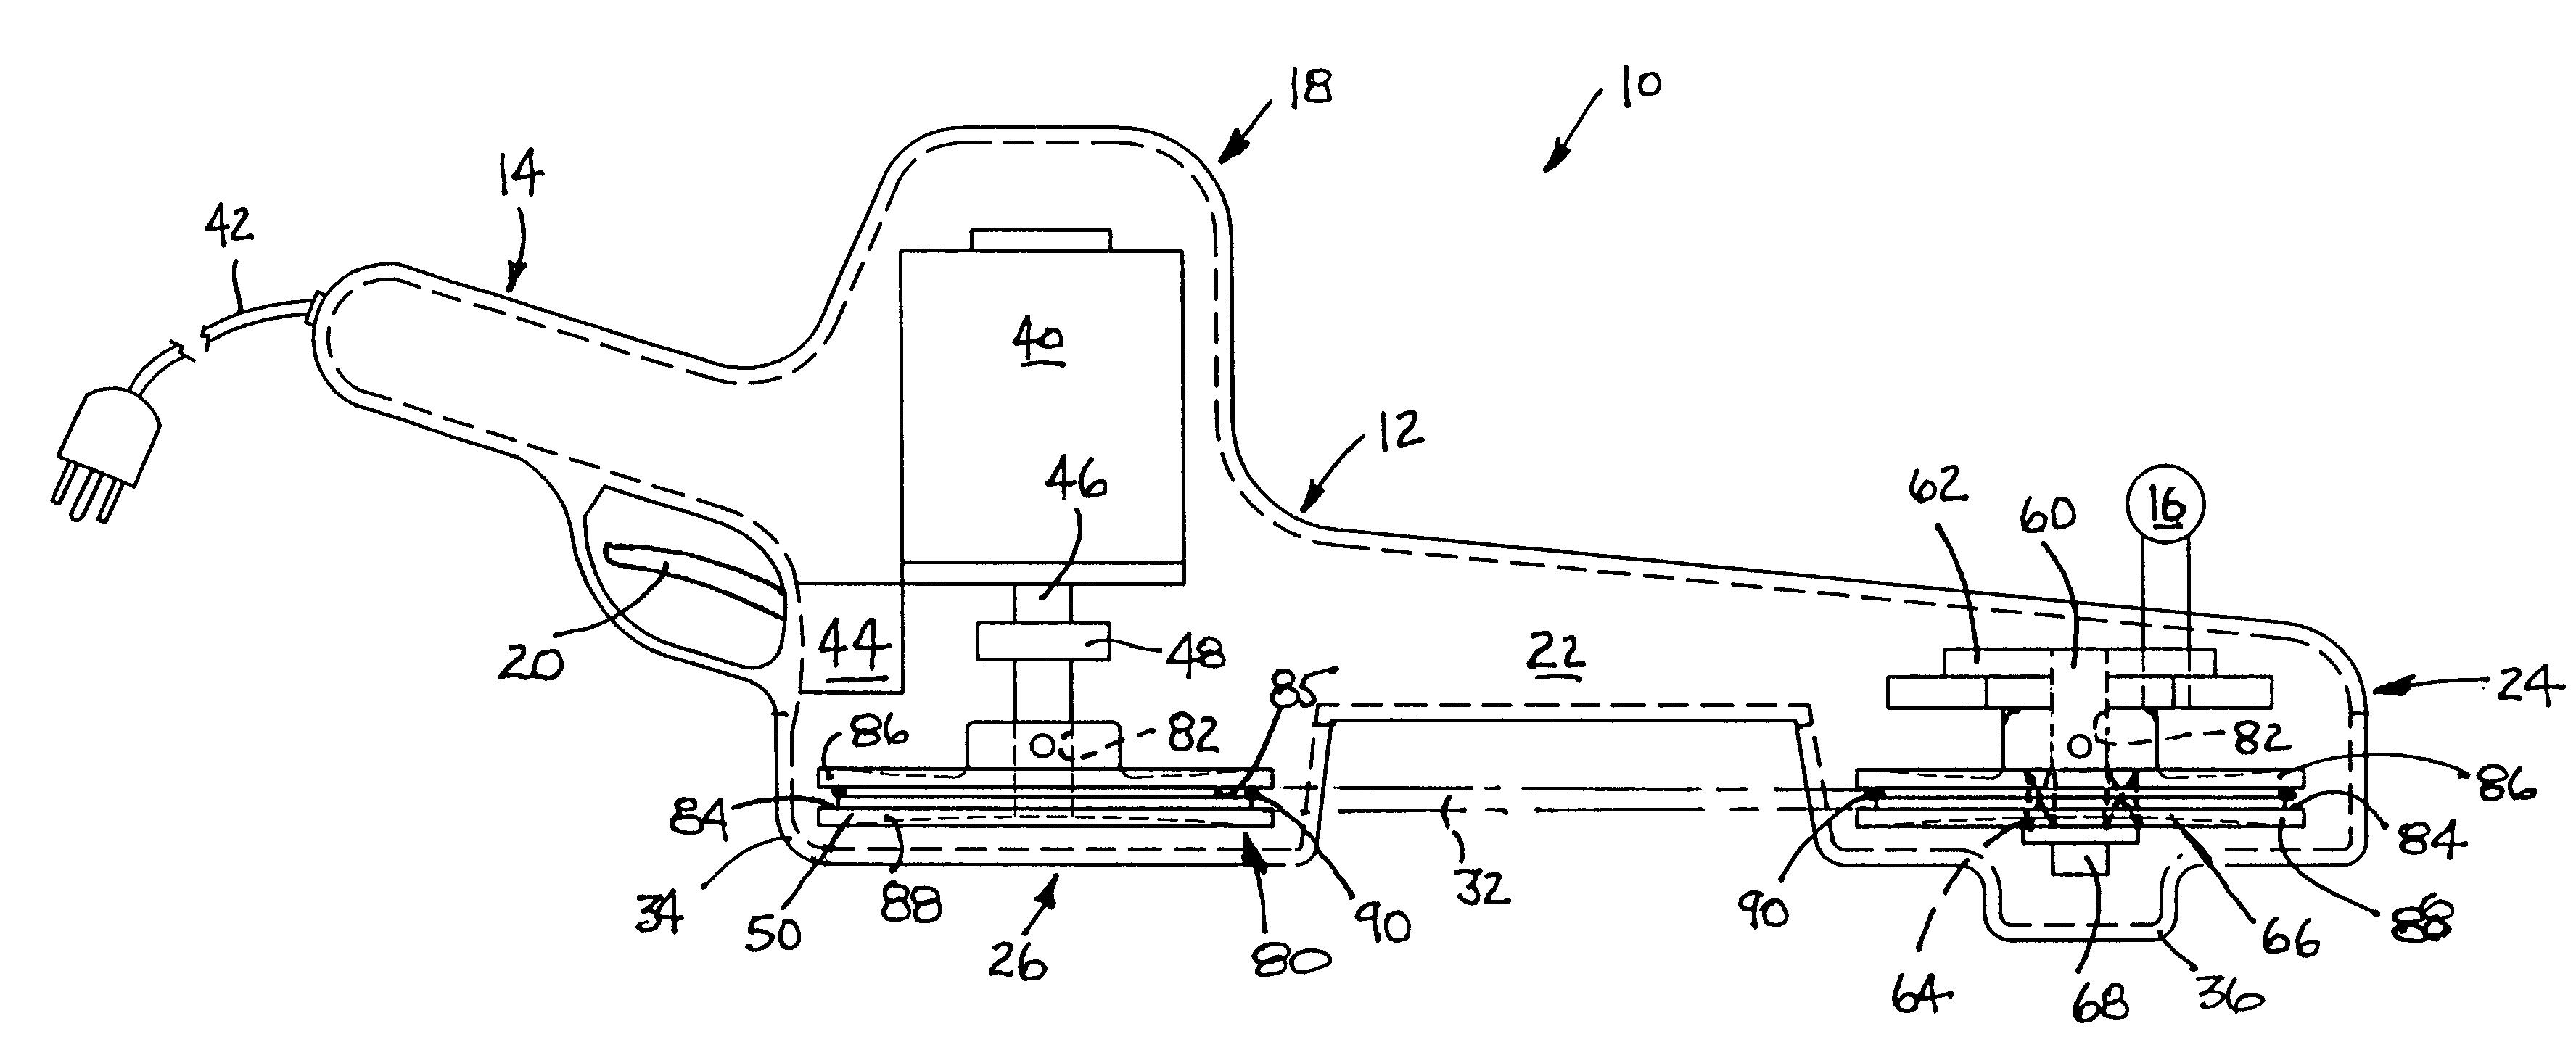 Patente US6442848 - Coping saw - Patentes do Google